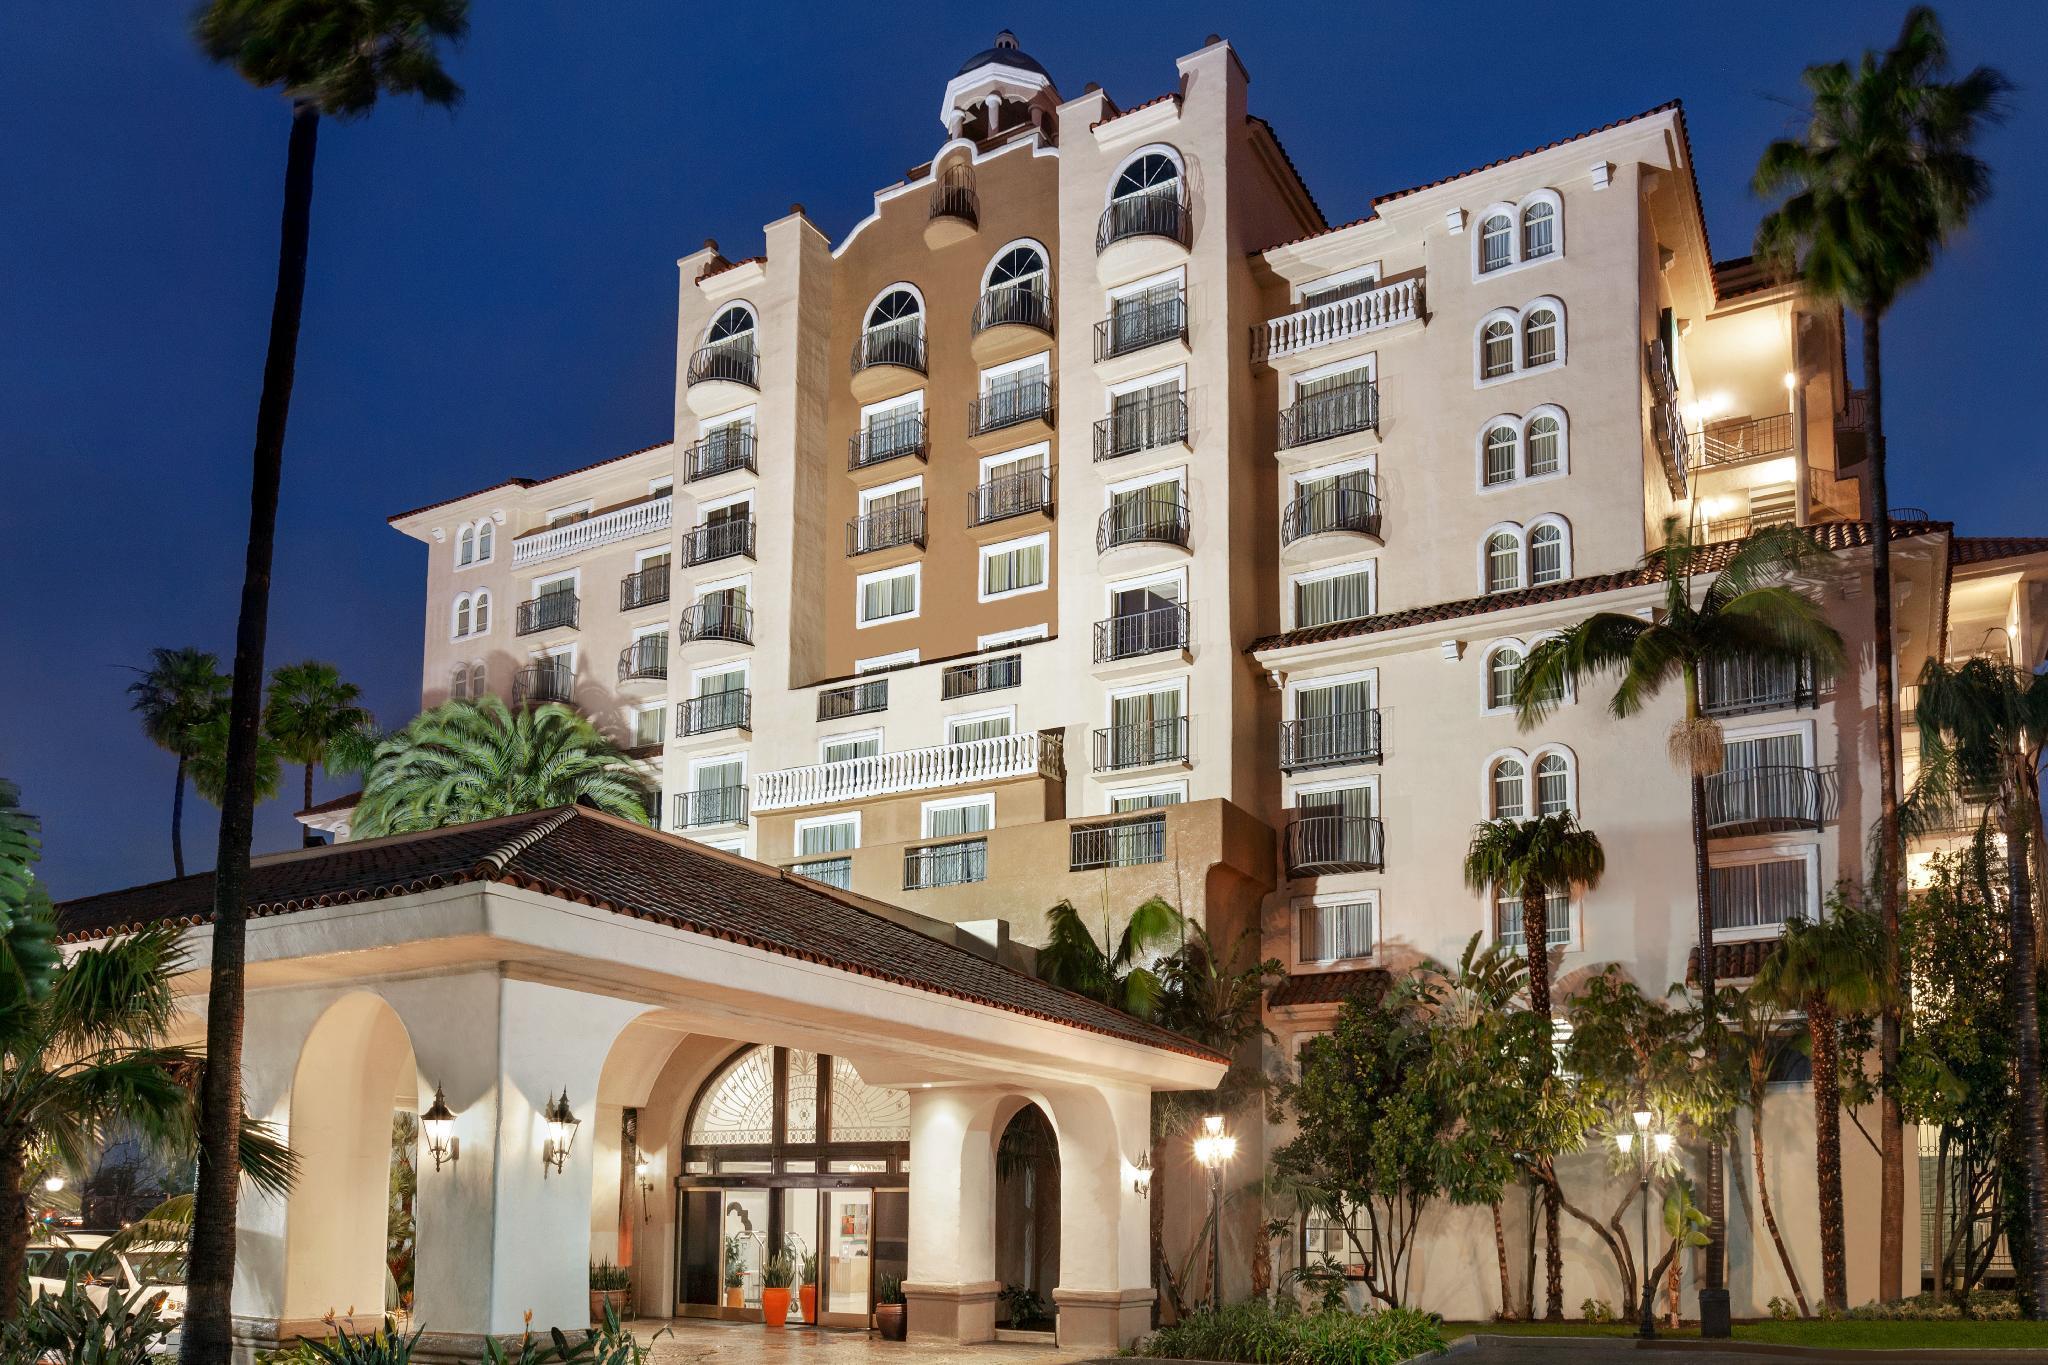 Embassy Suites By Hilton Santa Ana Orange County Airport